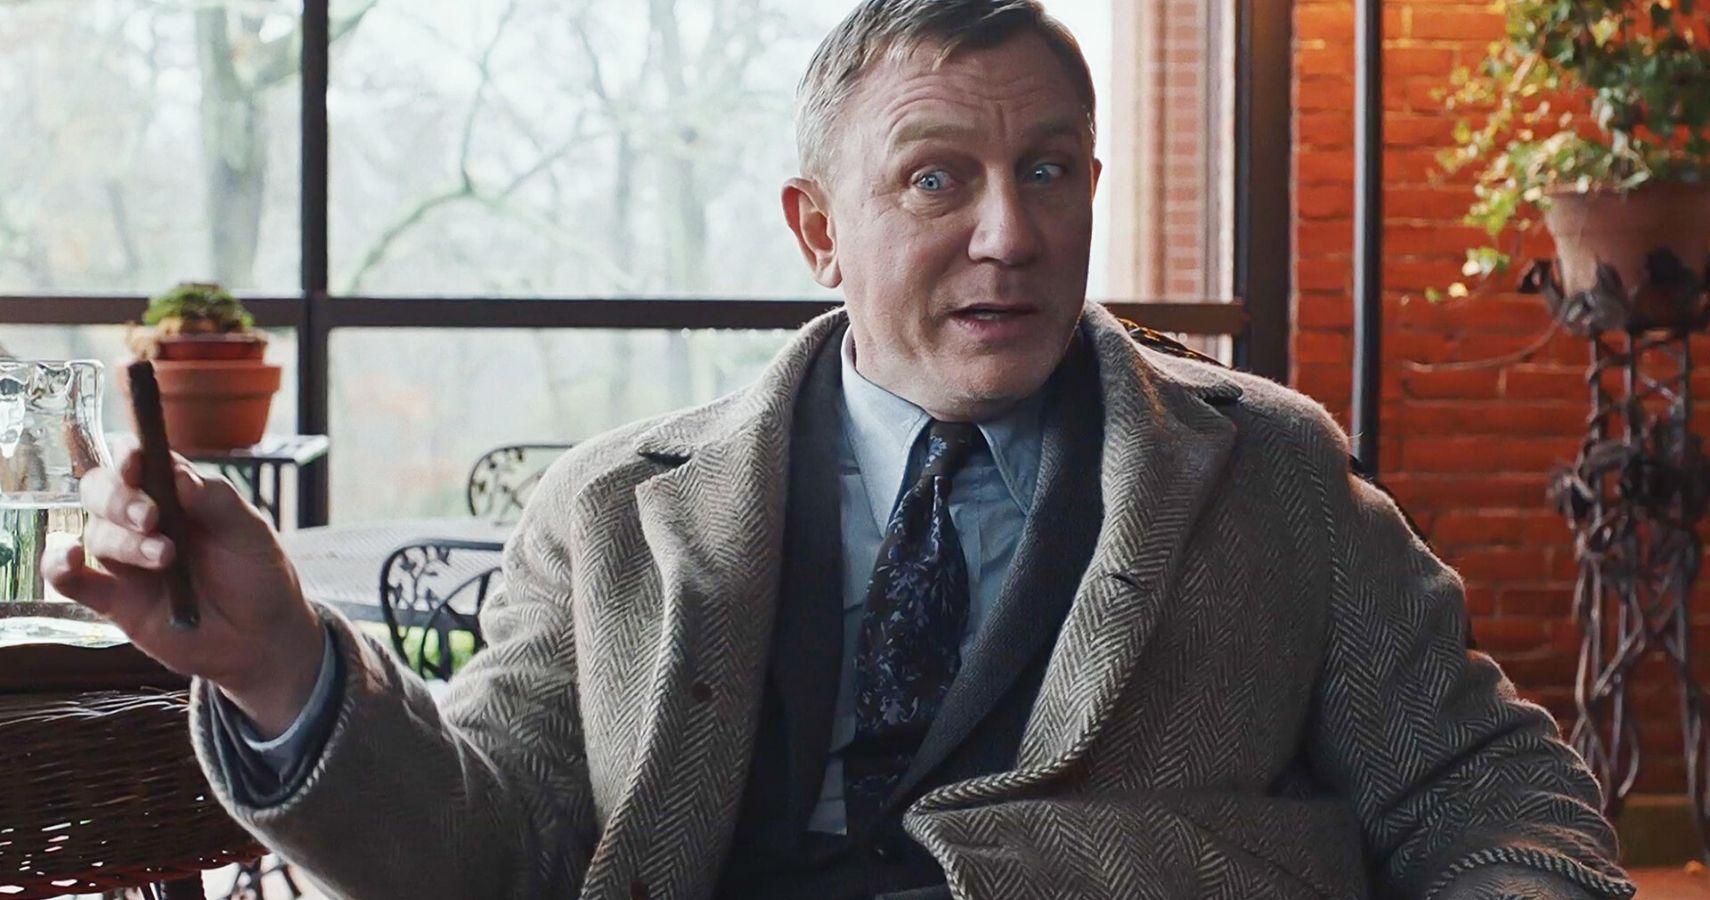 Top 10 Daniel Craig Non-007 Movies (According to Rotten ...